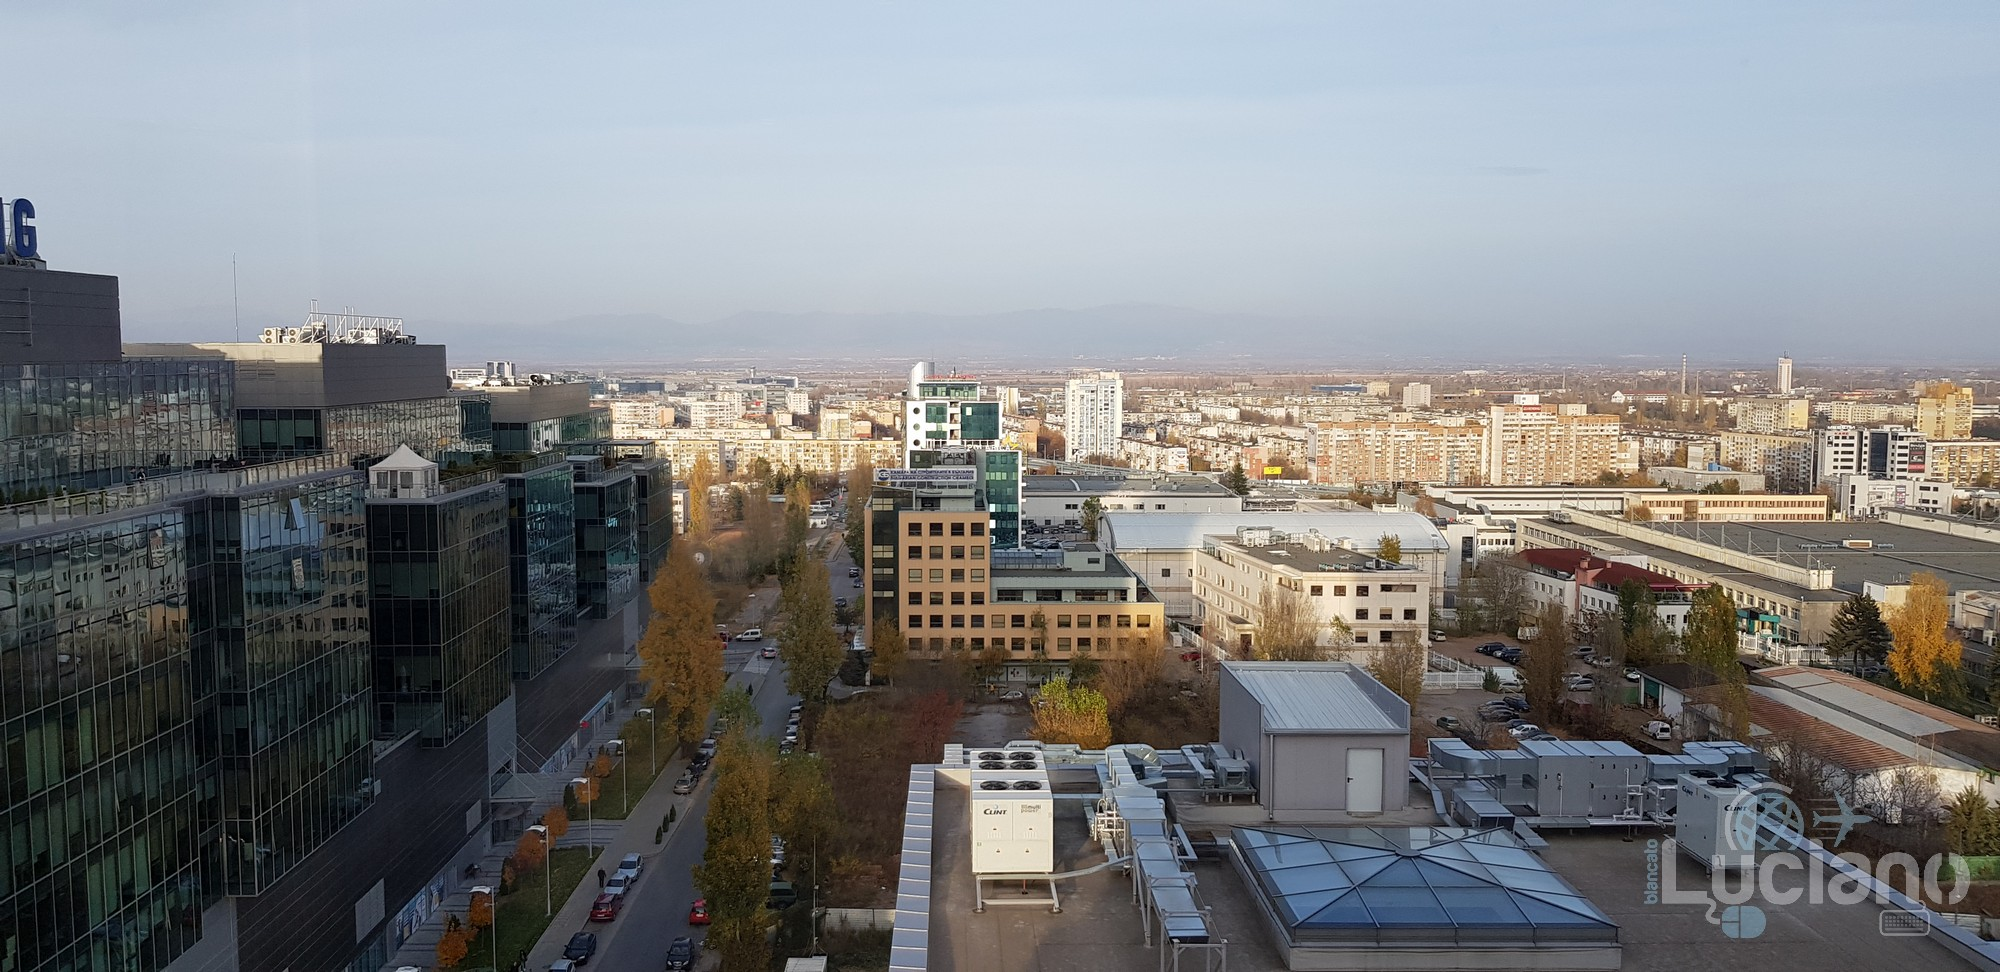 Novotel - SOFIA - Bulgaria - Vista Hotel